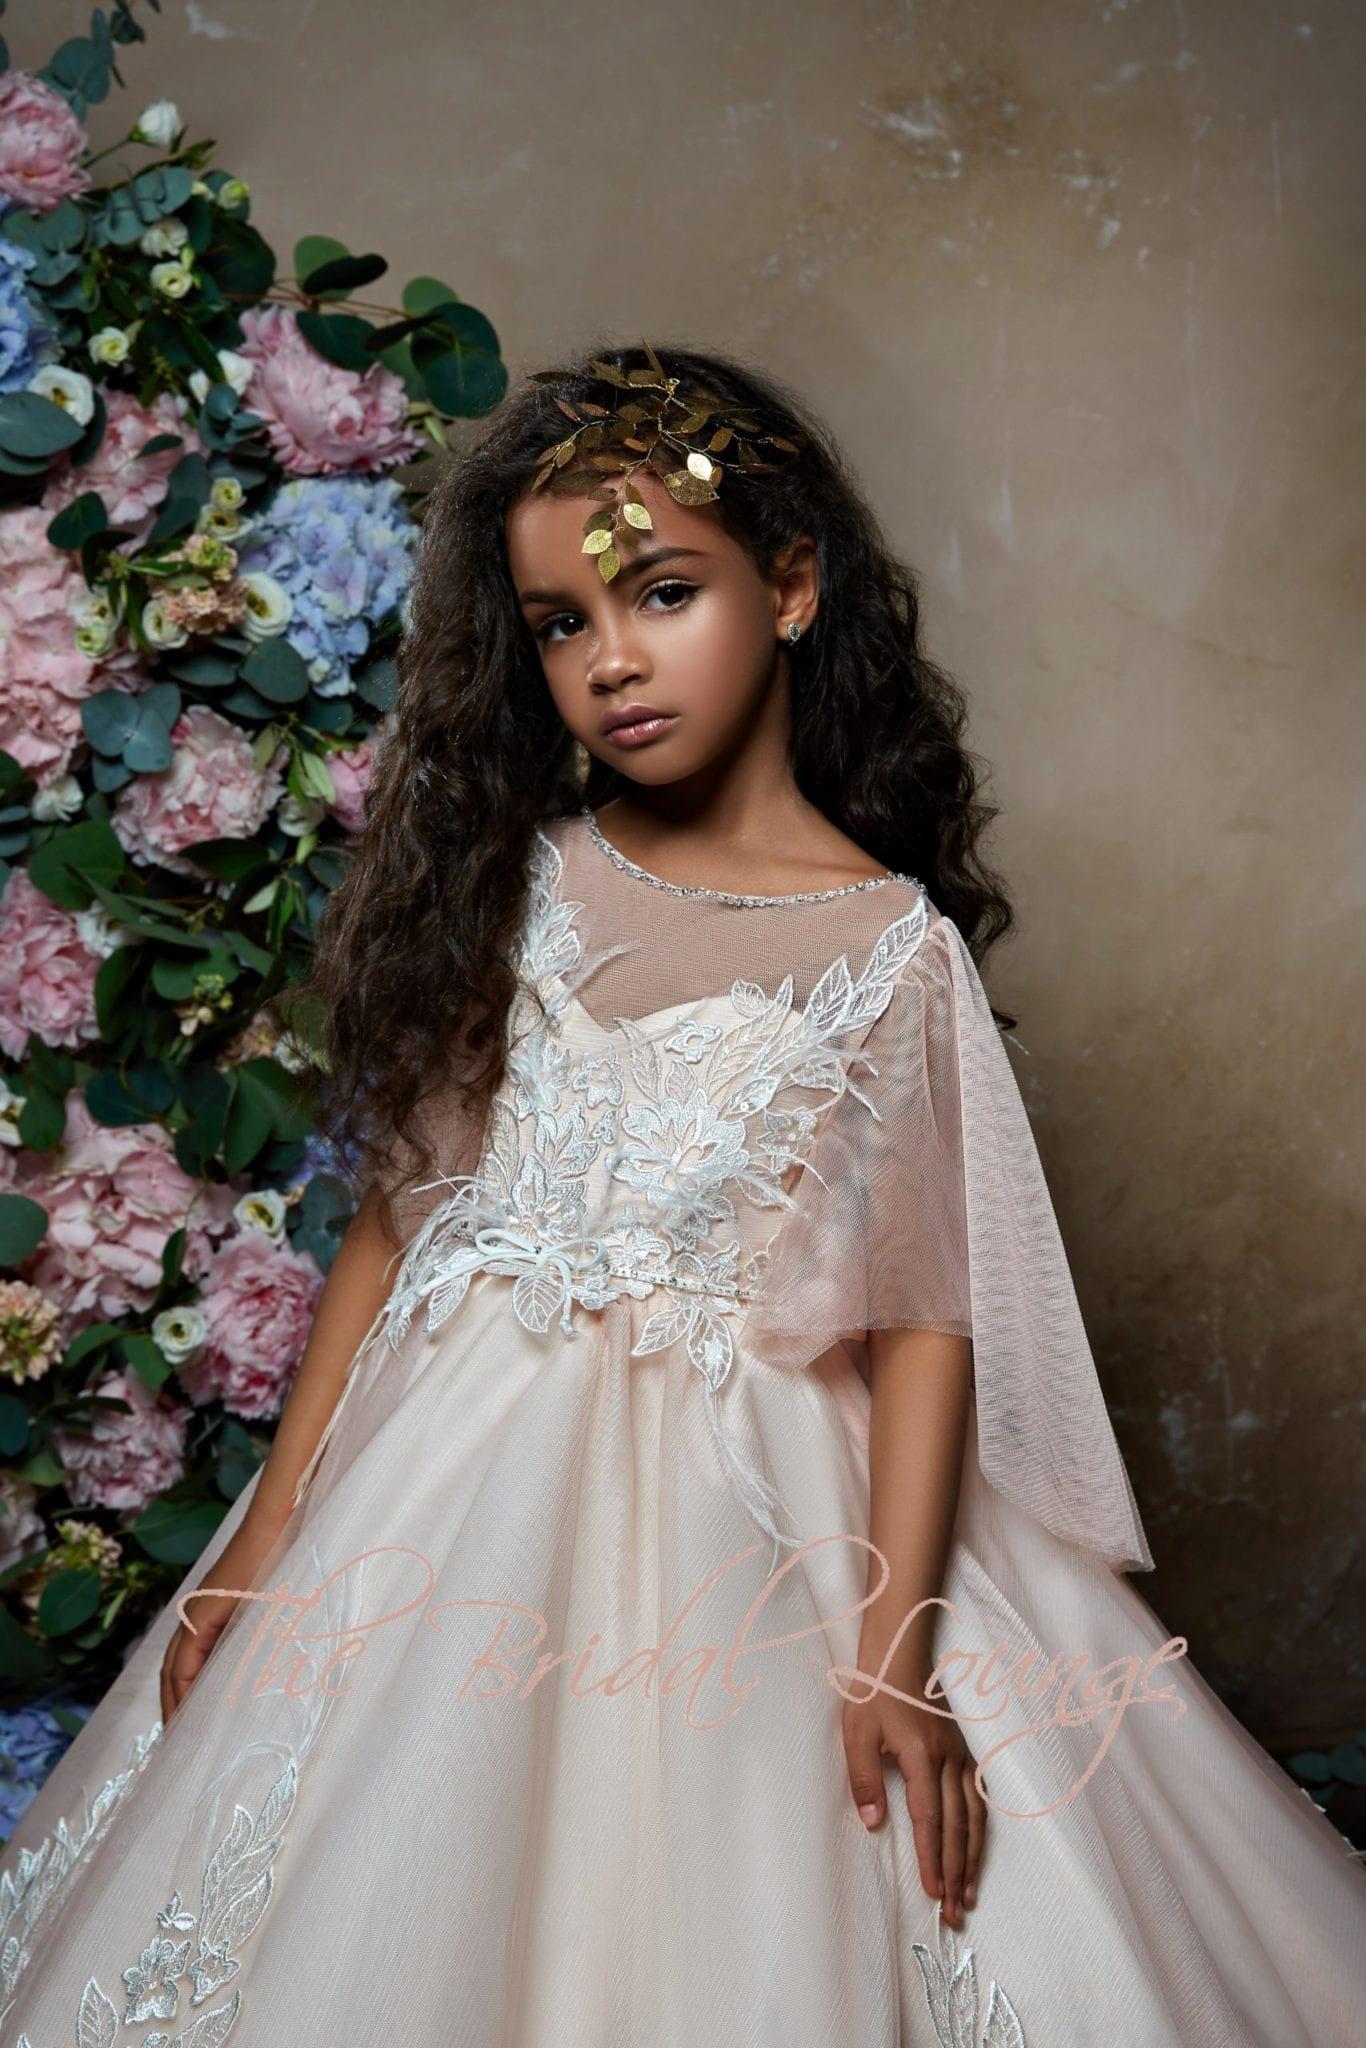 Pentelei flower girl dress 2303